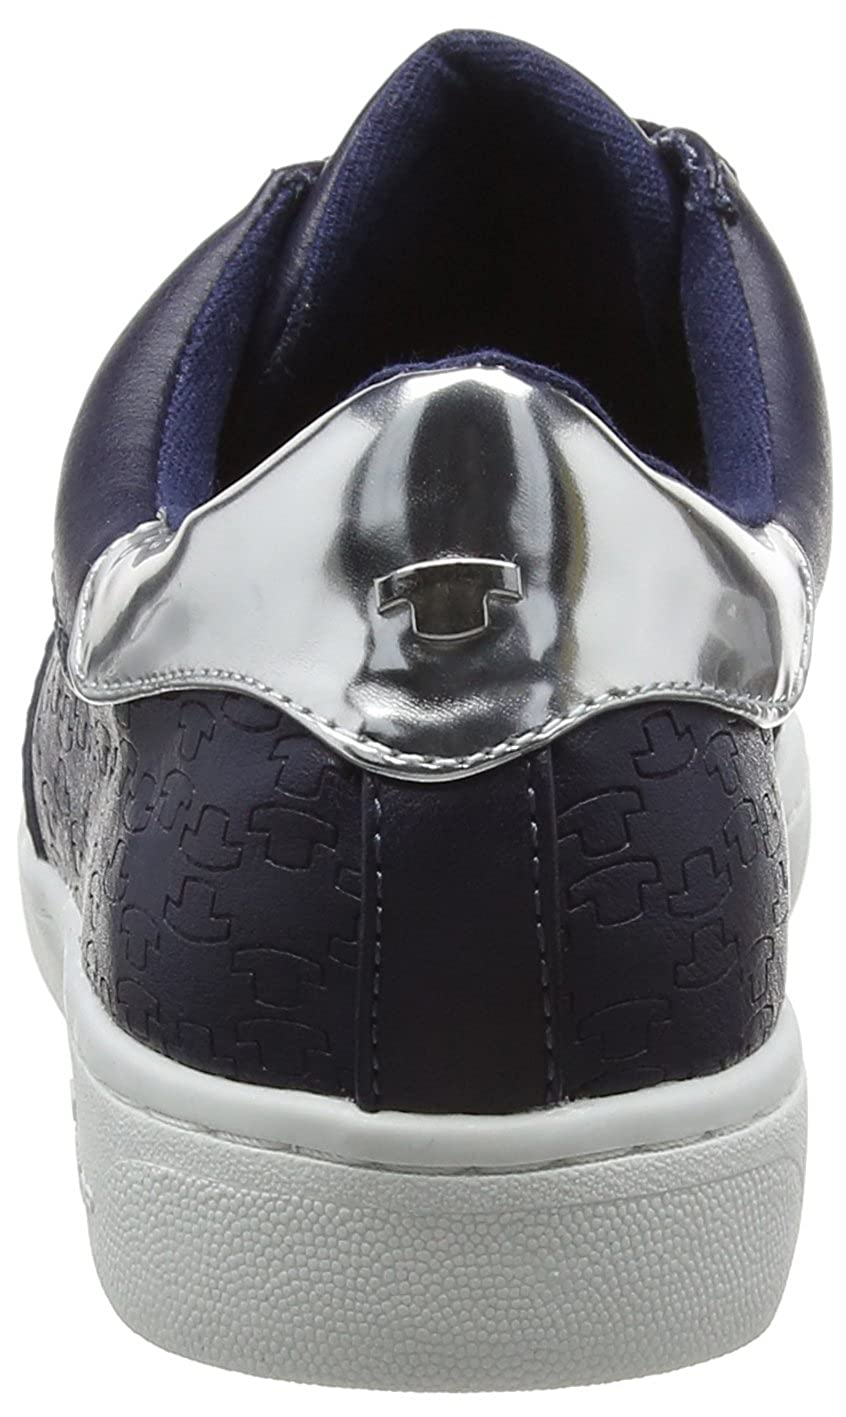 TOM TAILOR Sneakers Damen Damenschuhe Sneakers TAILOR Blau (Navy) 167b98